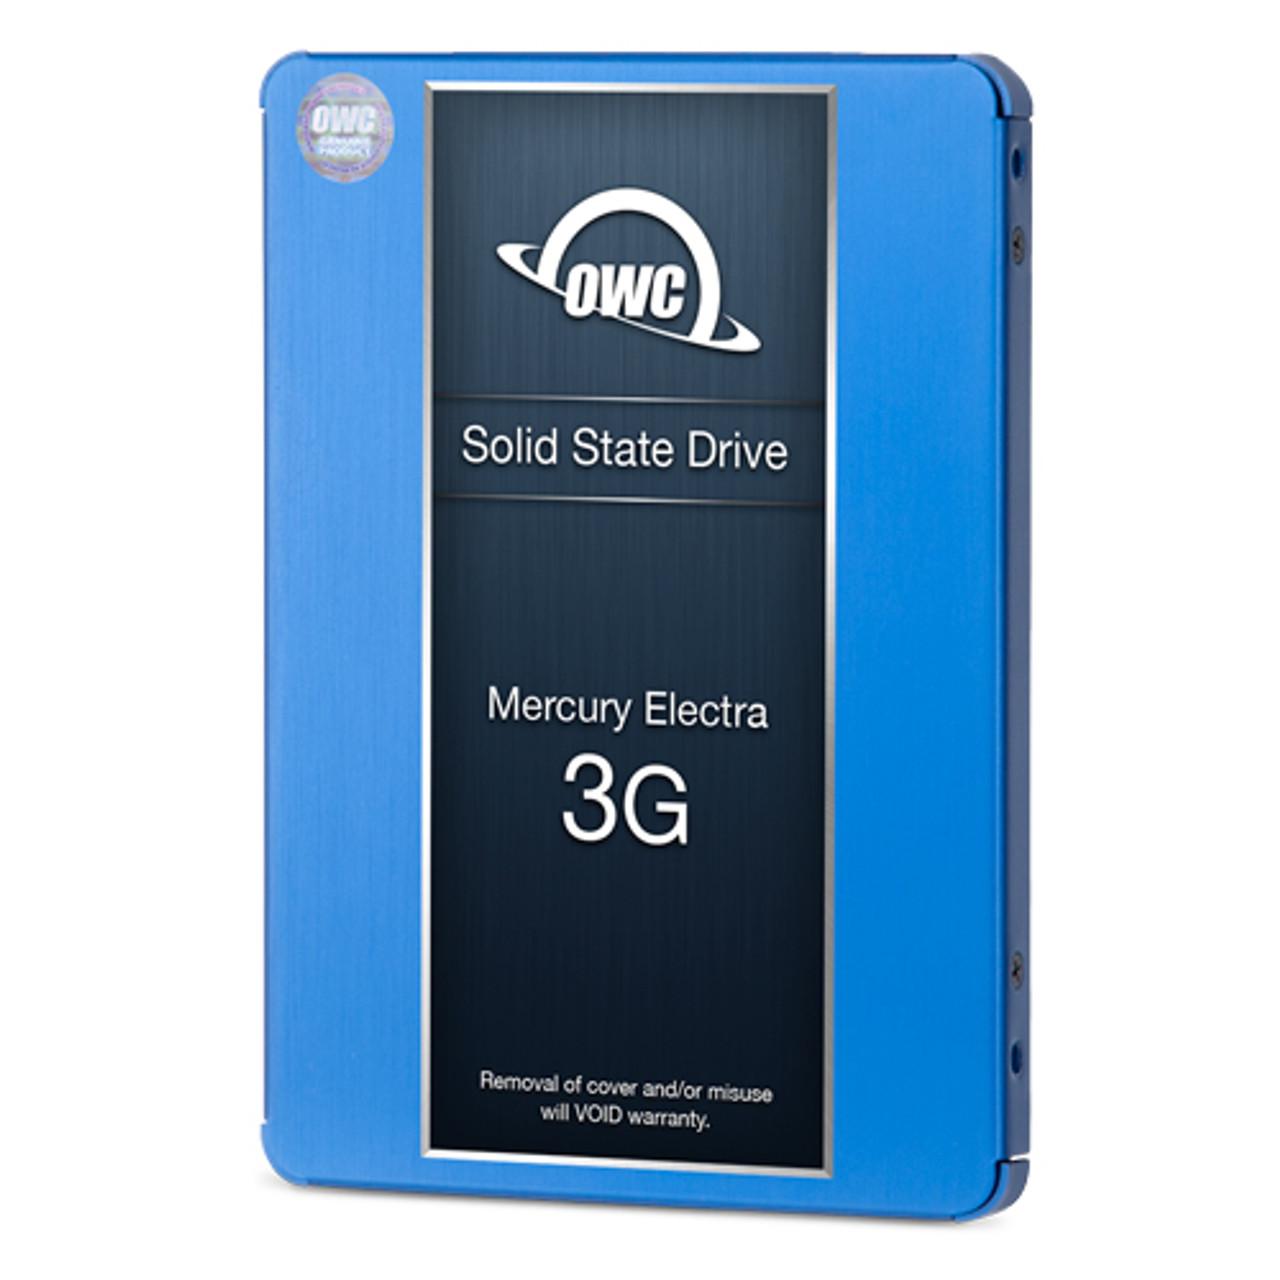 1TB OWC Mercury Electra 3G SSD and HDD DIY Bundle Kit for 2009 - 2010 iMac